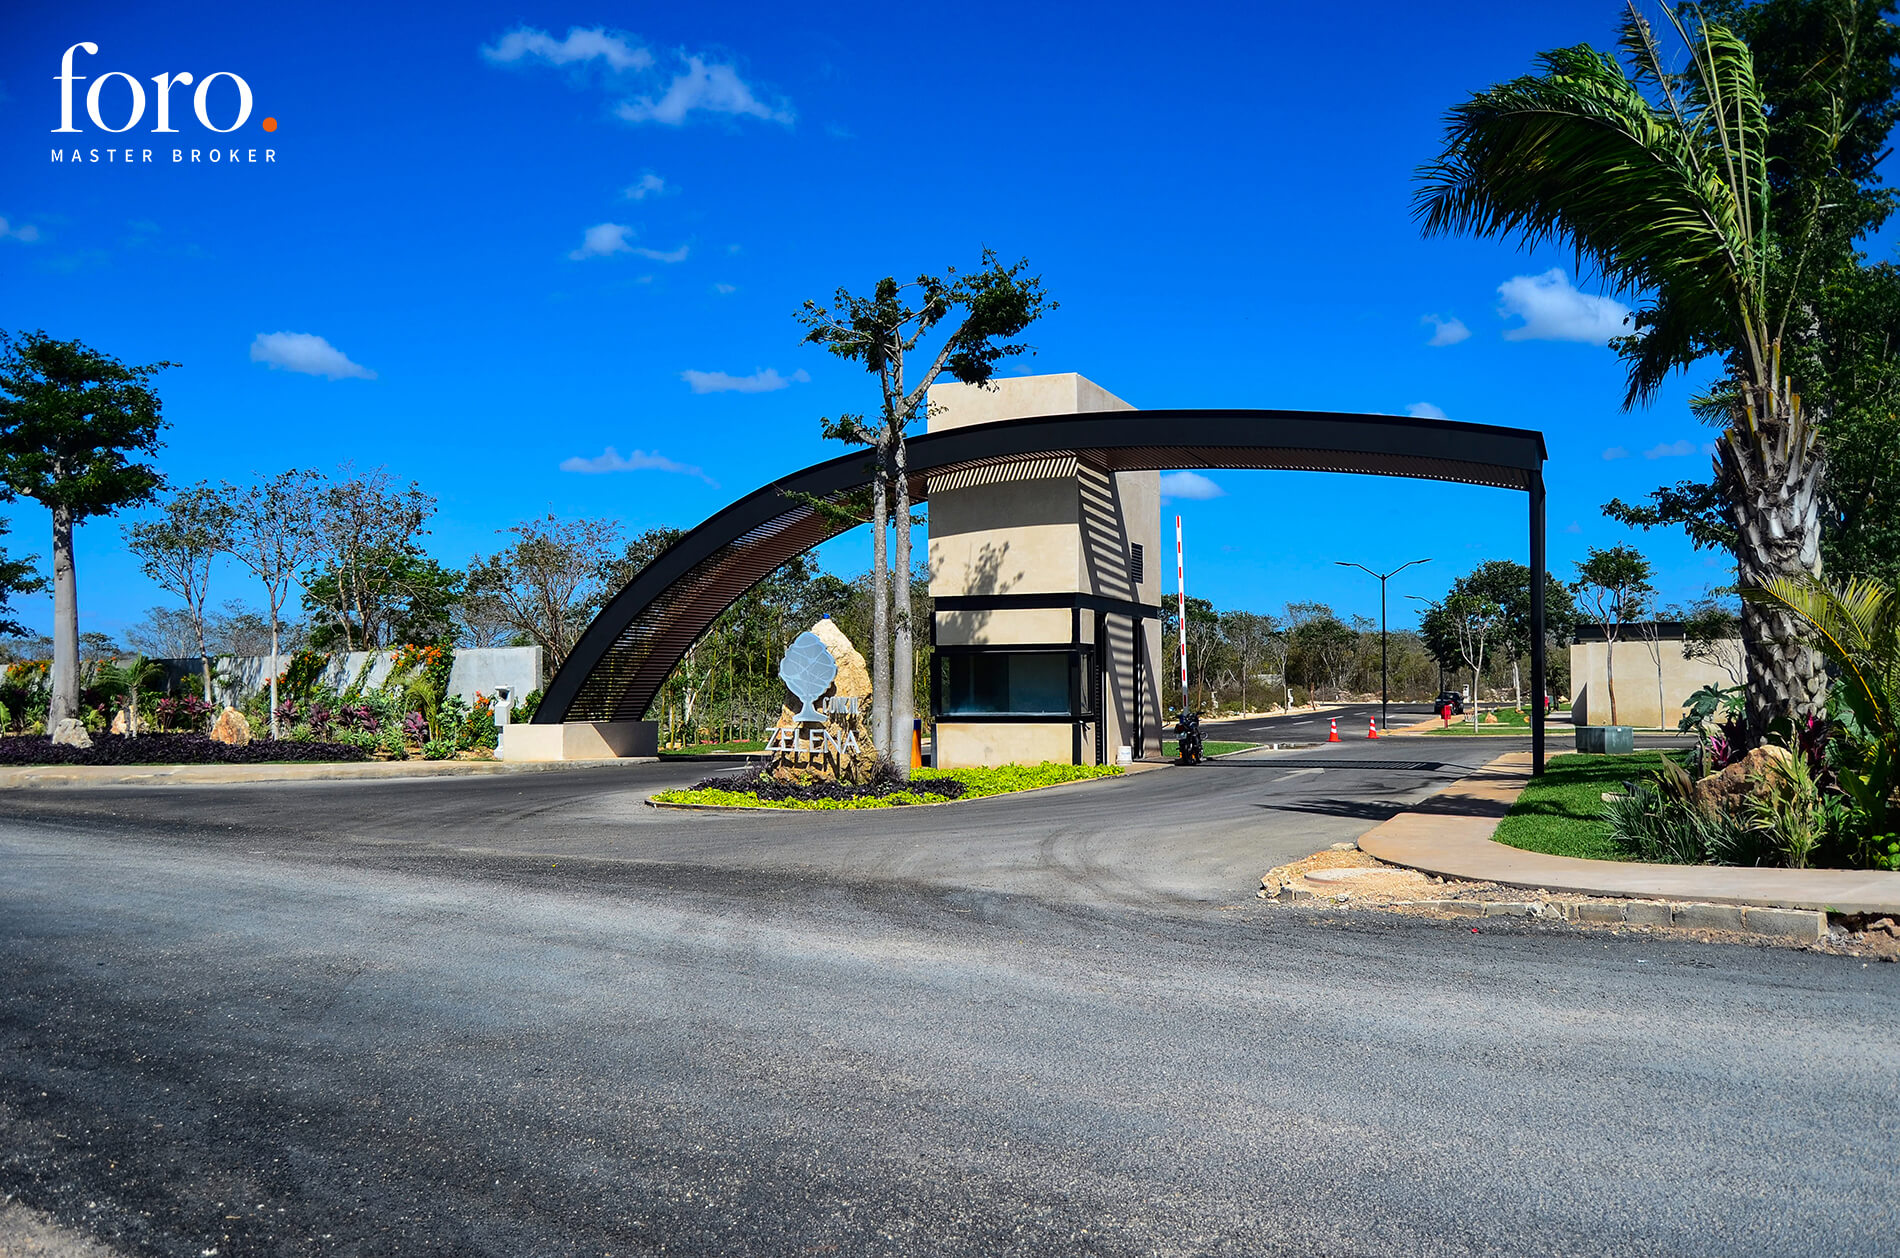 Casa en Privada ZELENA Zona Norte de Mérida Yucatán